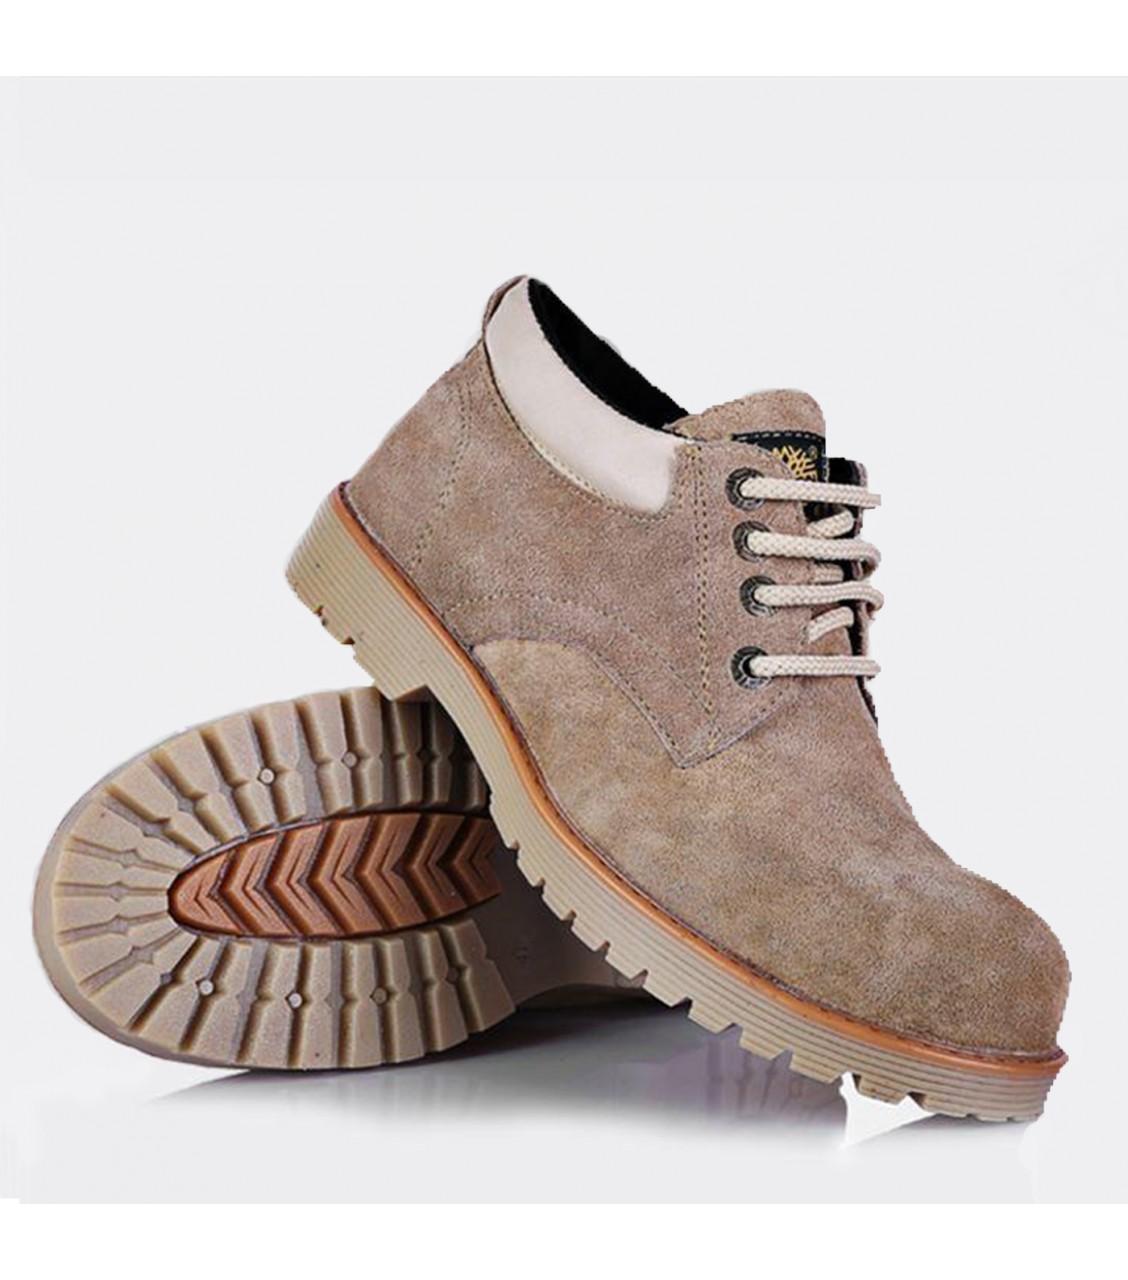 Shamoi Safety Shoes - Half Boot